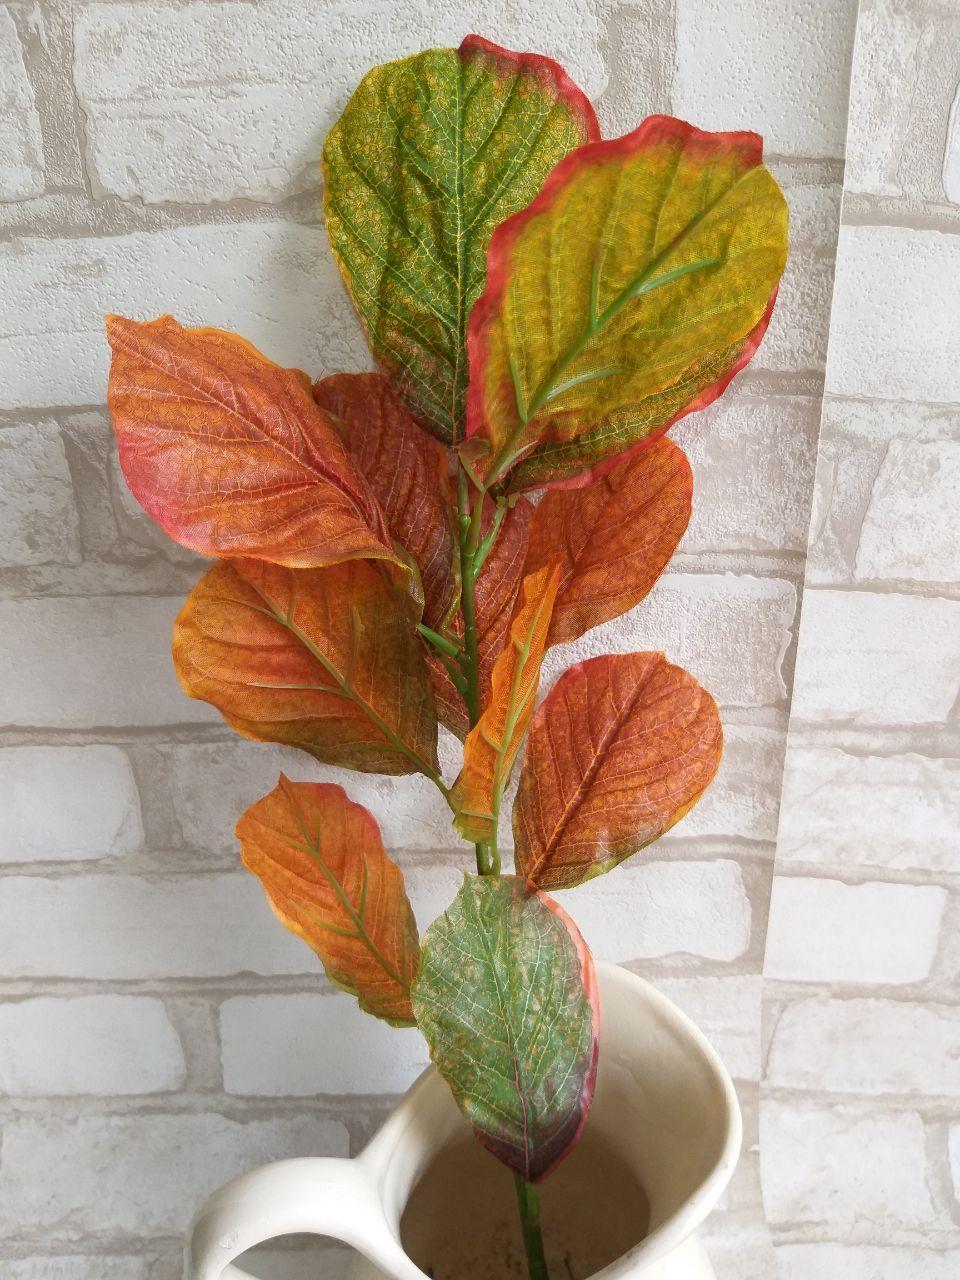 Листья осенние на ветке, в-45 см., 20/15 (цена за 1 шт. + 5 гр.)